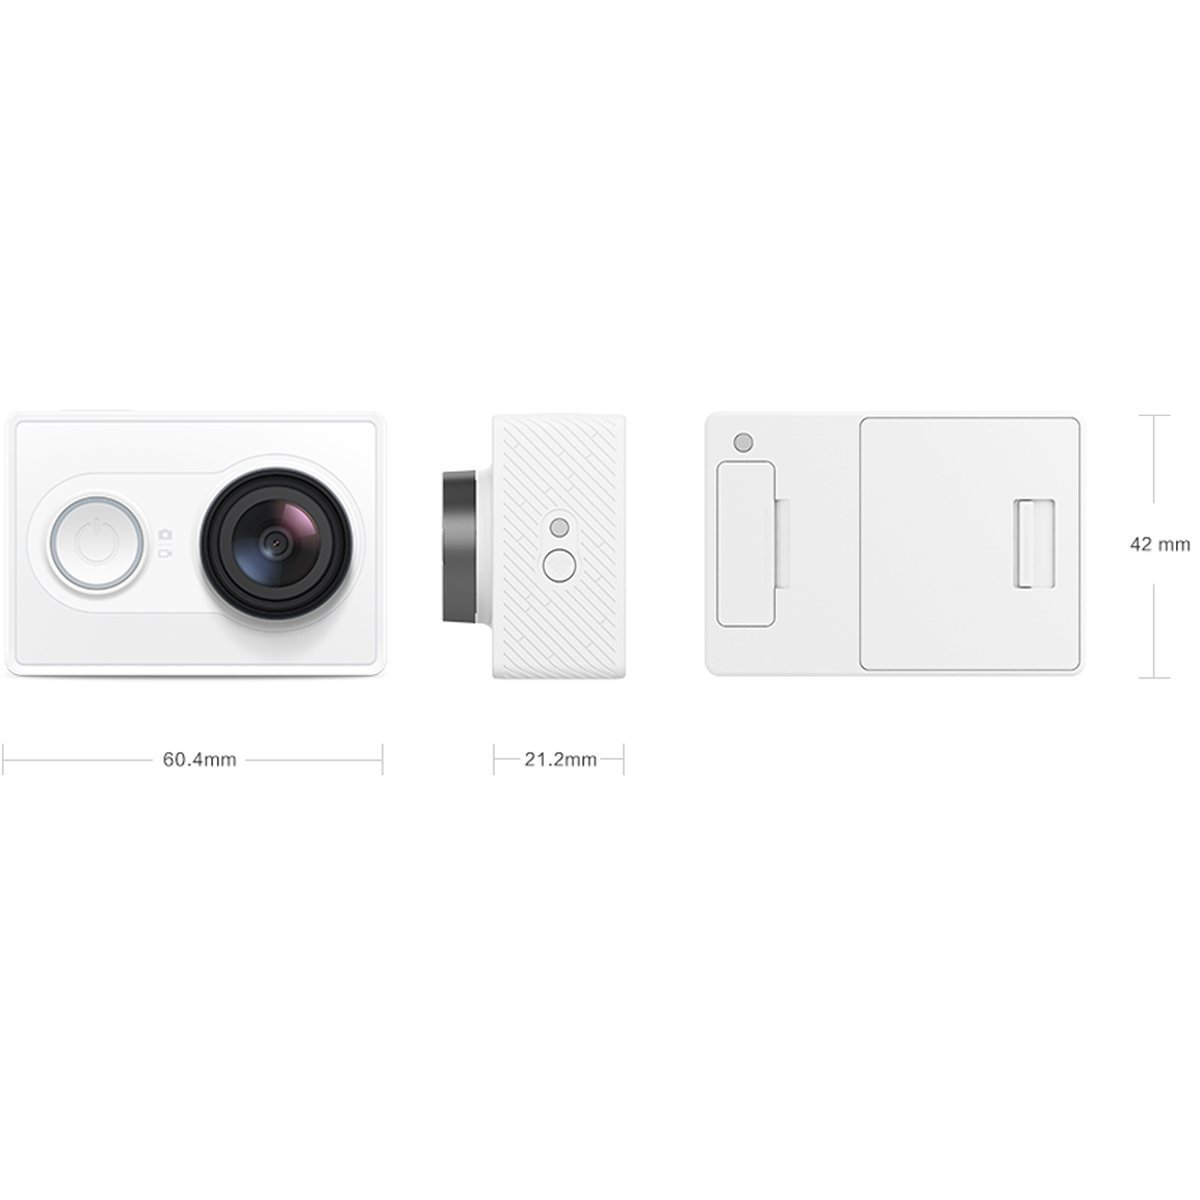 Xiaoyi Yi Action Camera With Wi Fi White Kingma Paket Complete Battery Charger Set For Xiaomi 4k Plus Lite International Version Photo